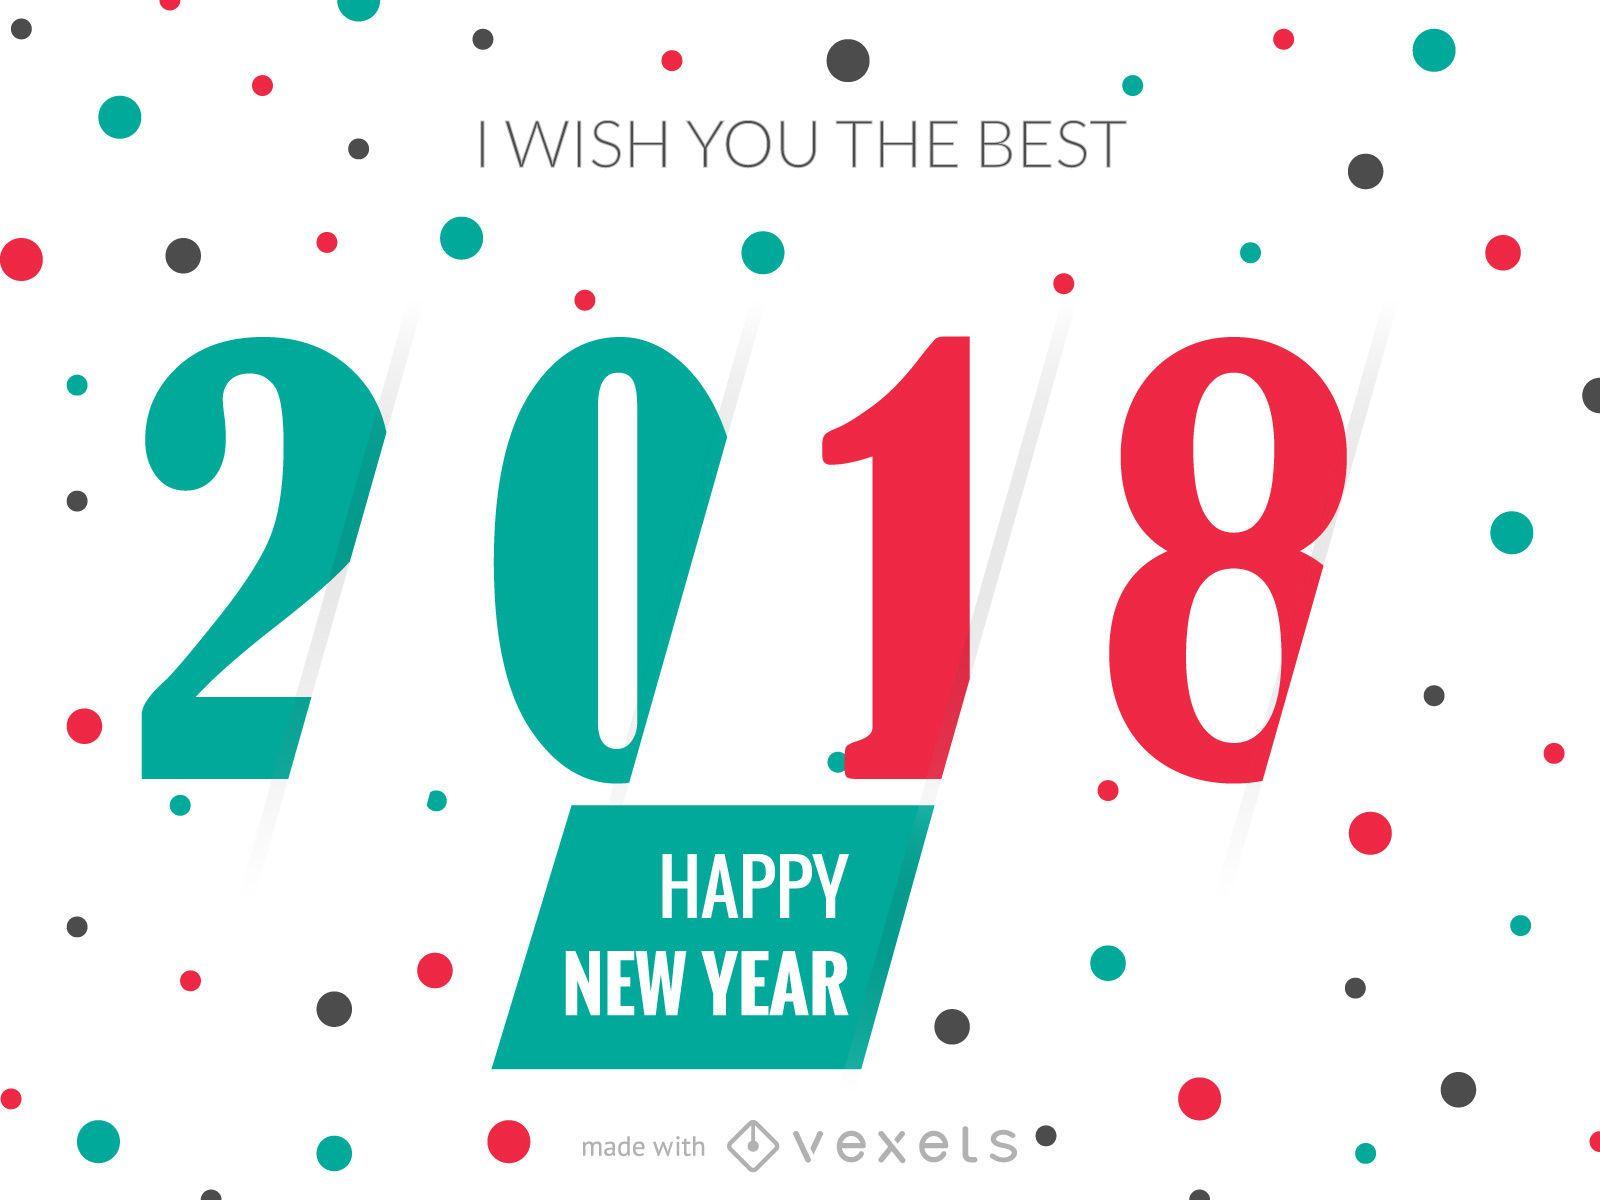 2018 New Year Greeting Card Maker Editable Design